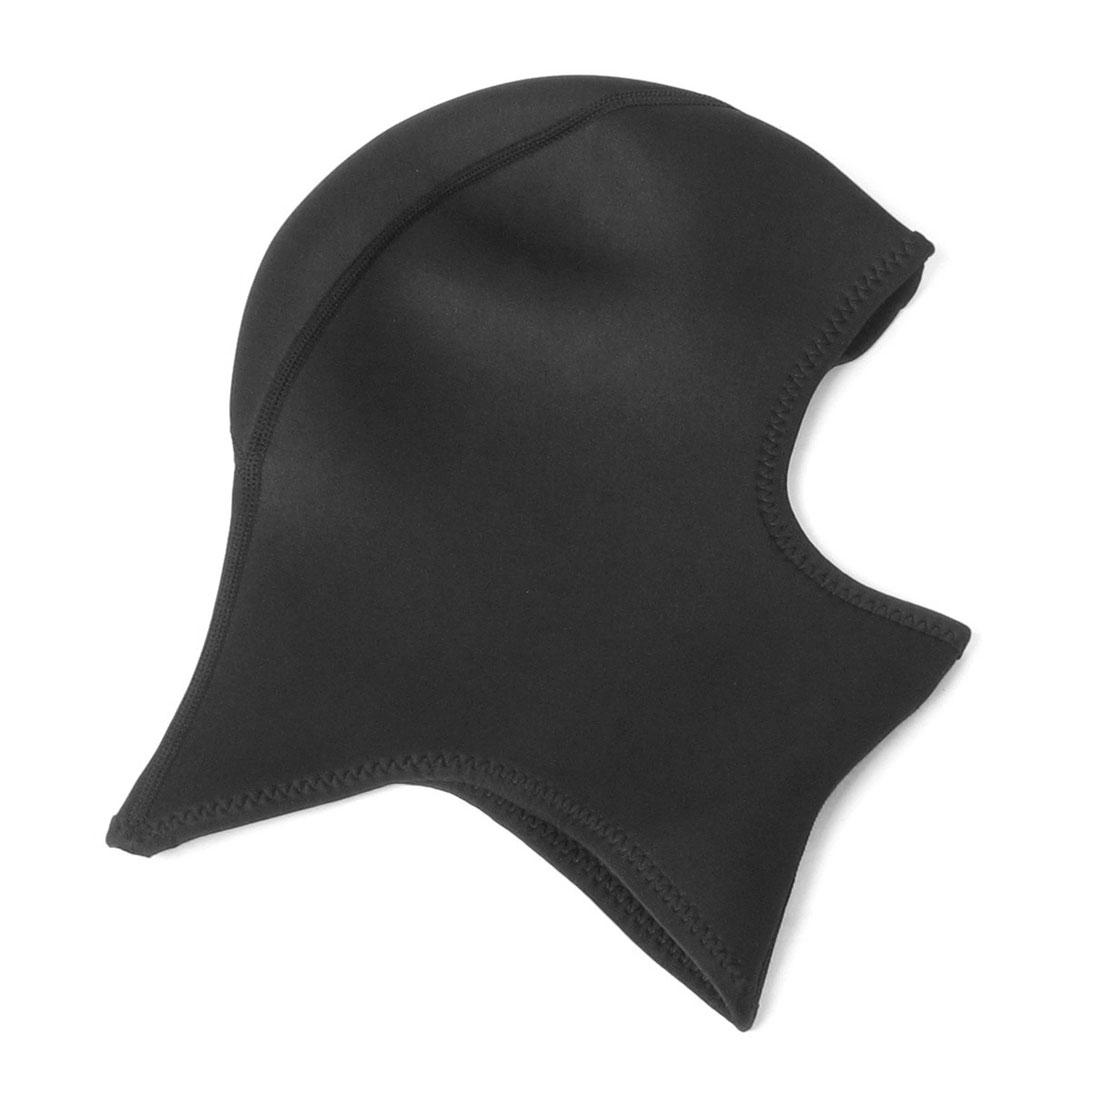 Motorbike Biker Black Stretchy Support Head Neck Mask Thin Balaclava L